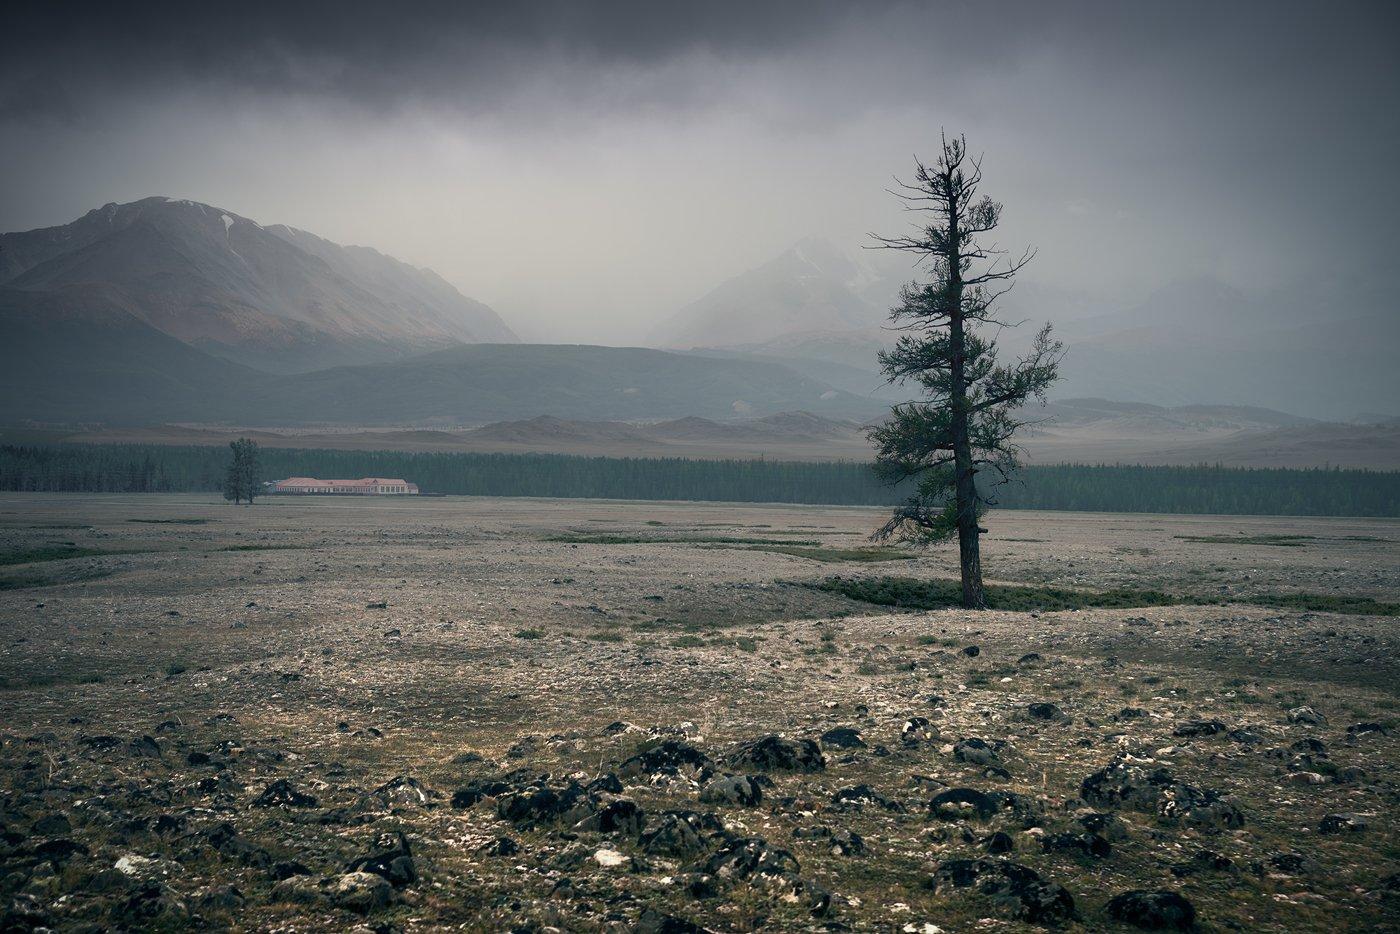 пейзаж, природа, горы, степь, долина, дерево, непогода, туман, облака, хмурый, хребет, вершины, большой, широкий, высокий, красивая, алтай, сибирь, россия, landscape, nature, mountains, steppe, valley, tree, bad weather, fog, clouds, gloomy, ridge, peaks,, Дмитрий Антипов